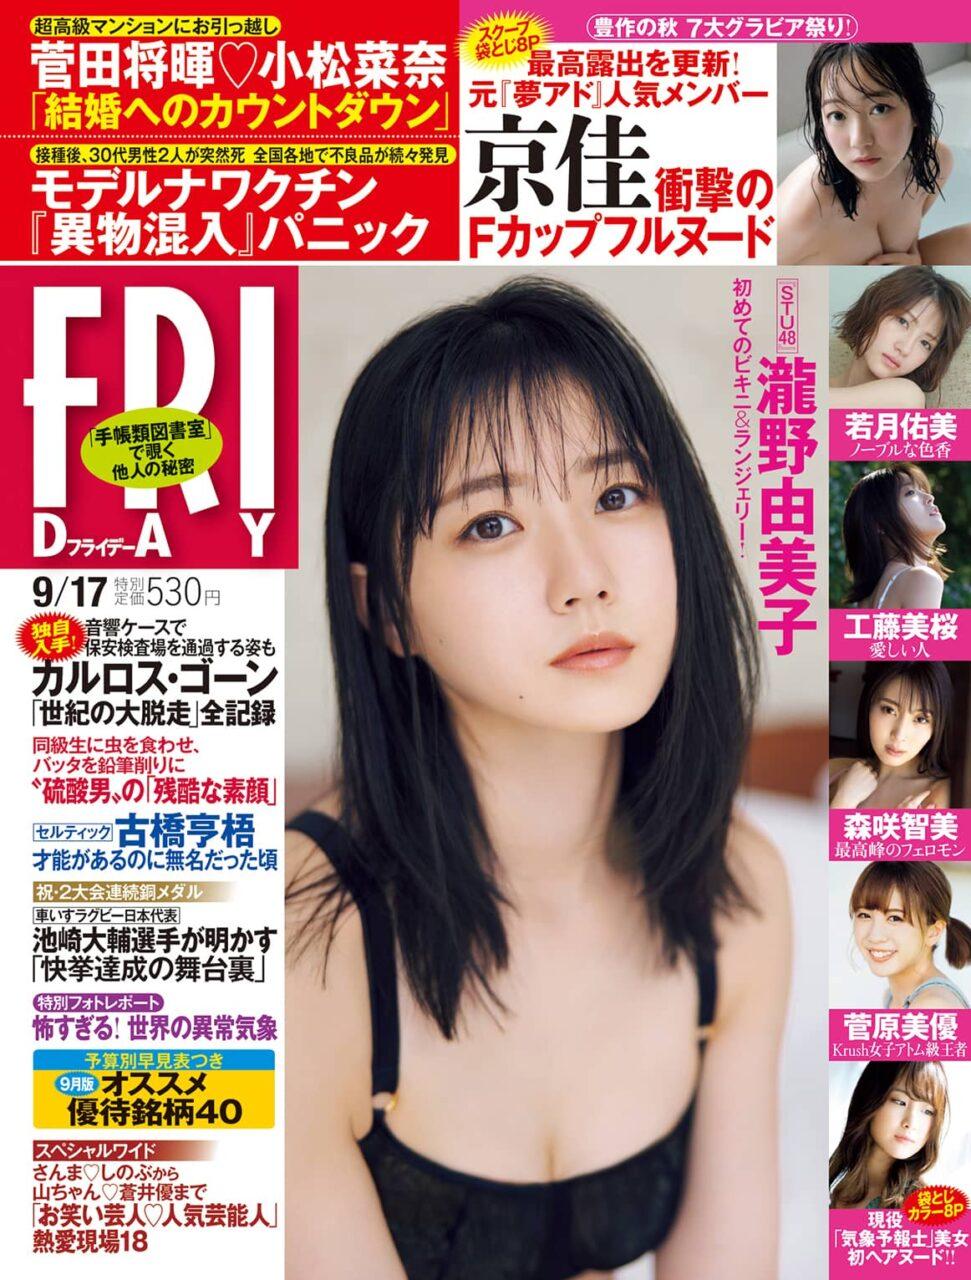 STU48 瀧野由美子が表紙に登場!初ビキニ&ランジェリー!「FRIDAY」本日9/3発売!